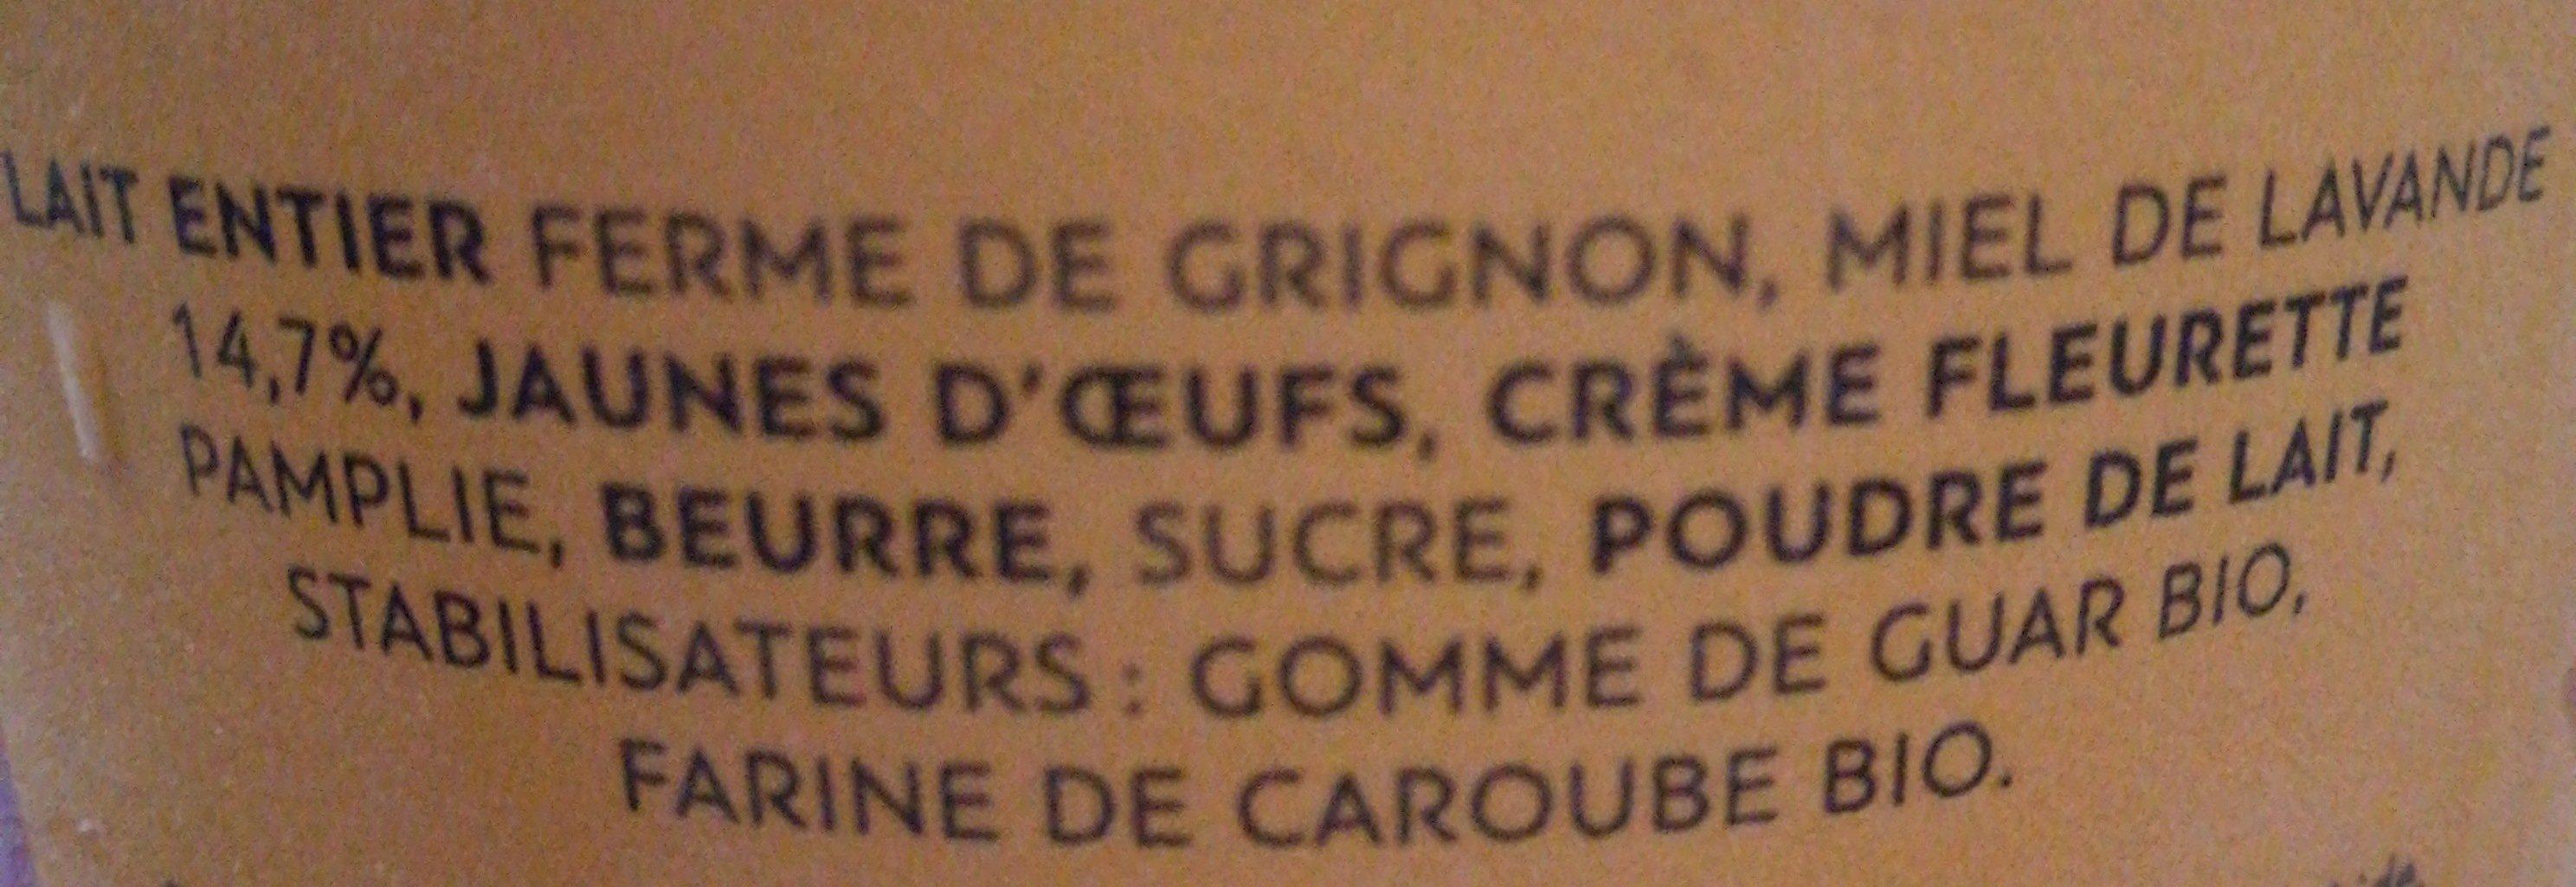 Glace Alpérel miel lavande - Ingredients